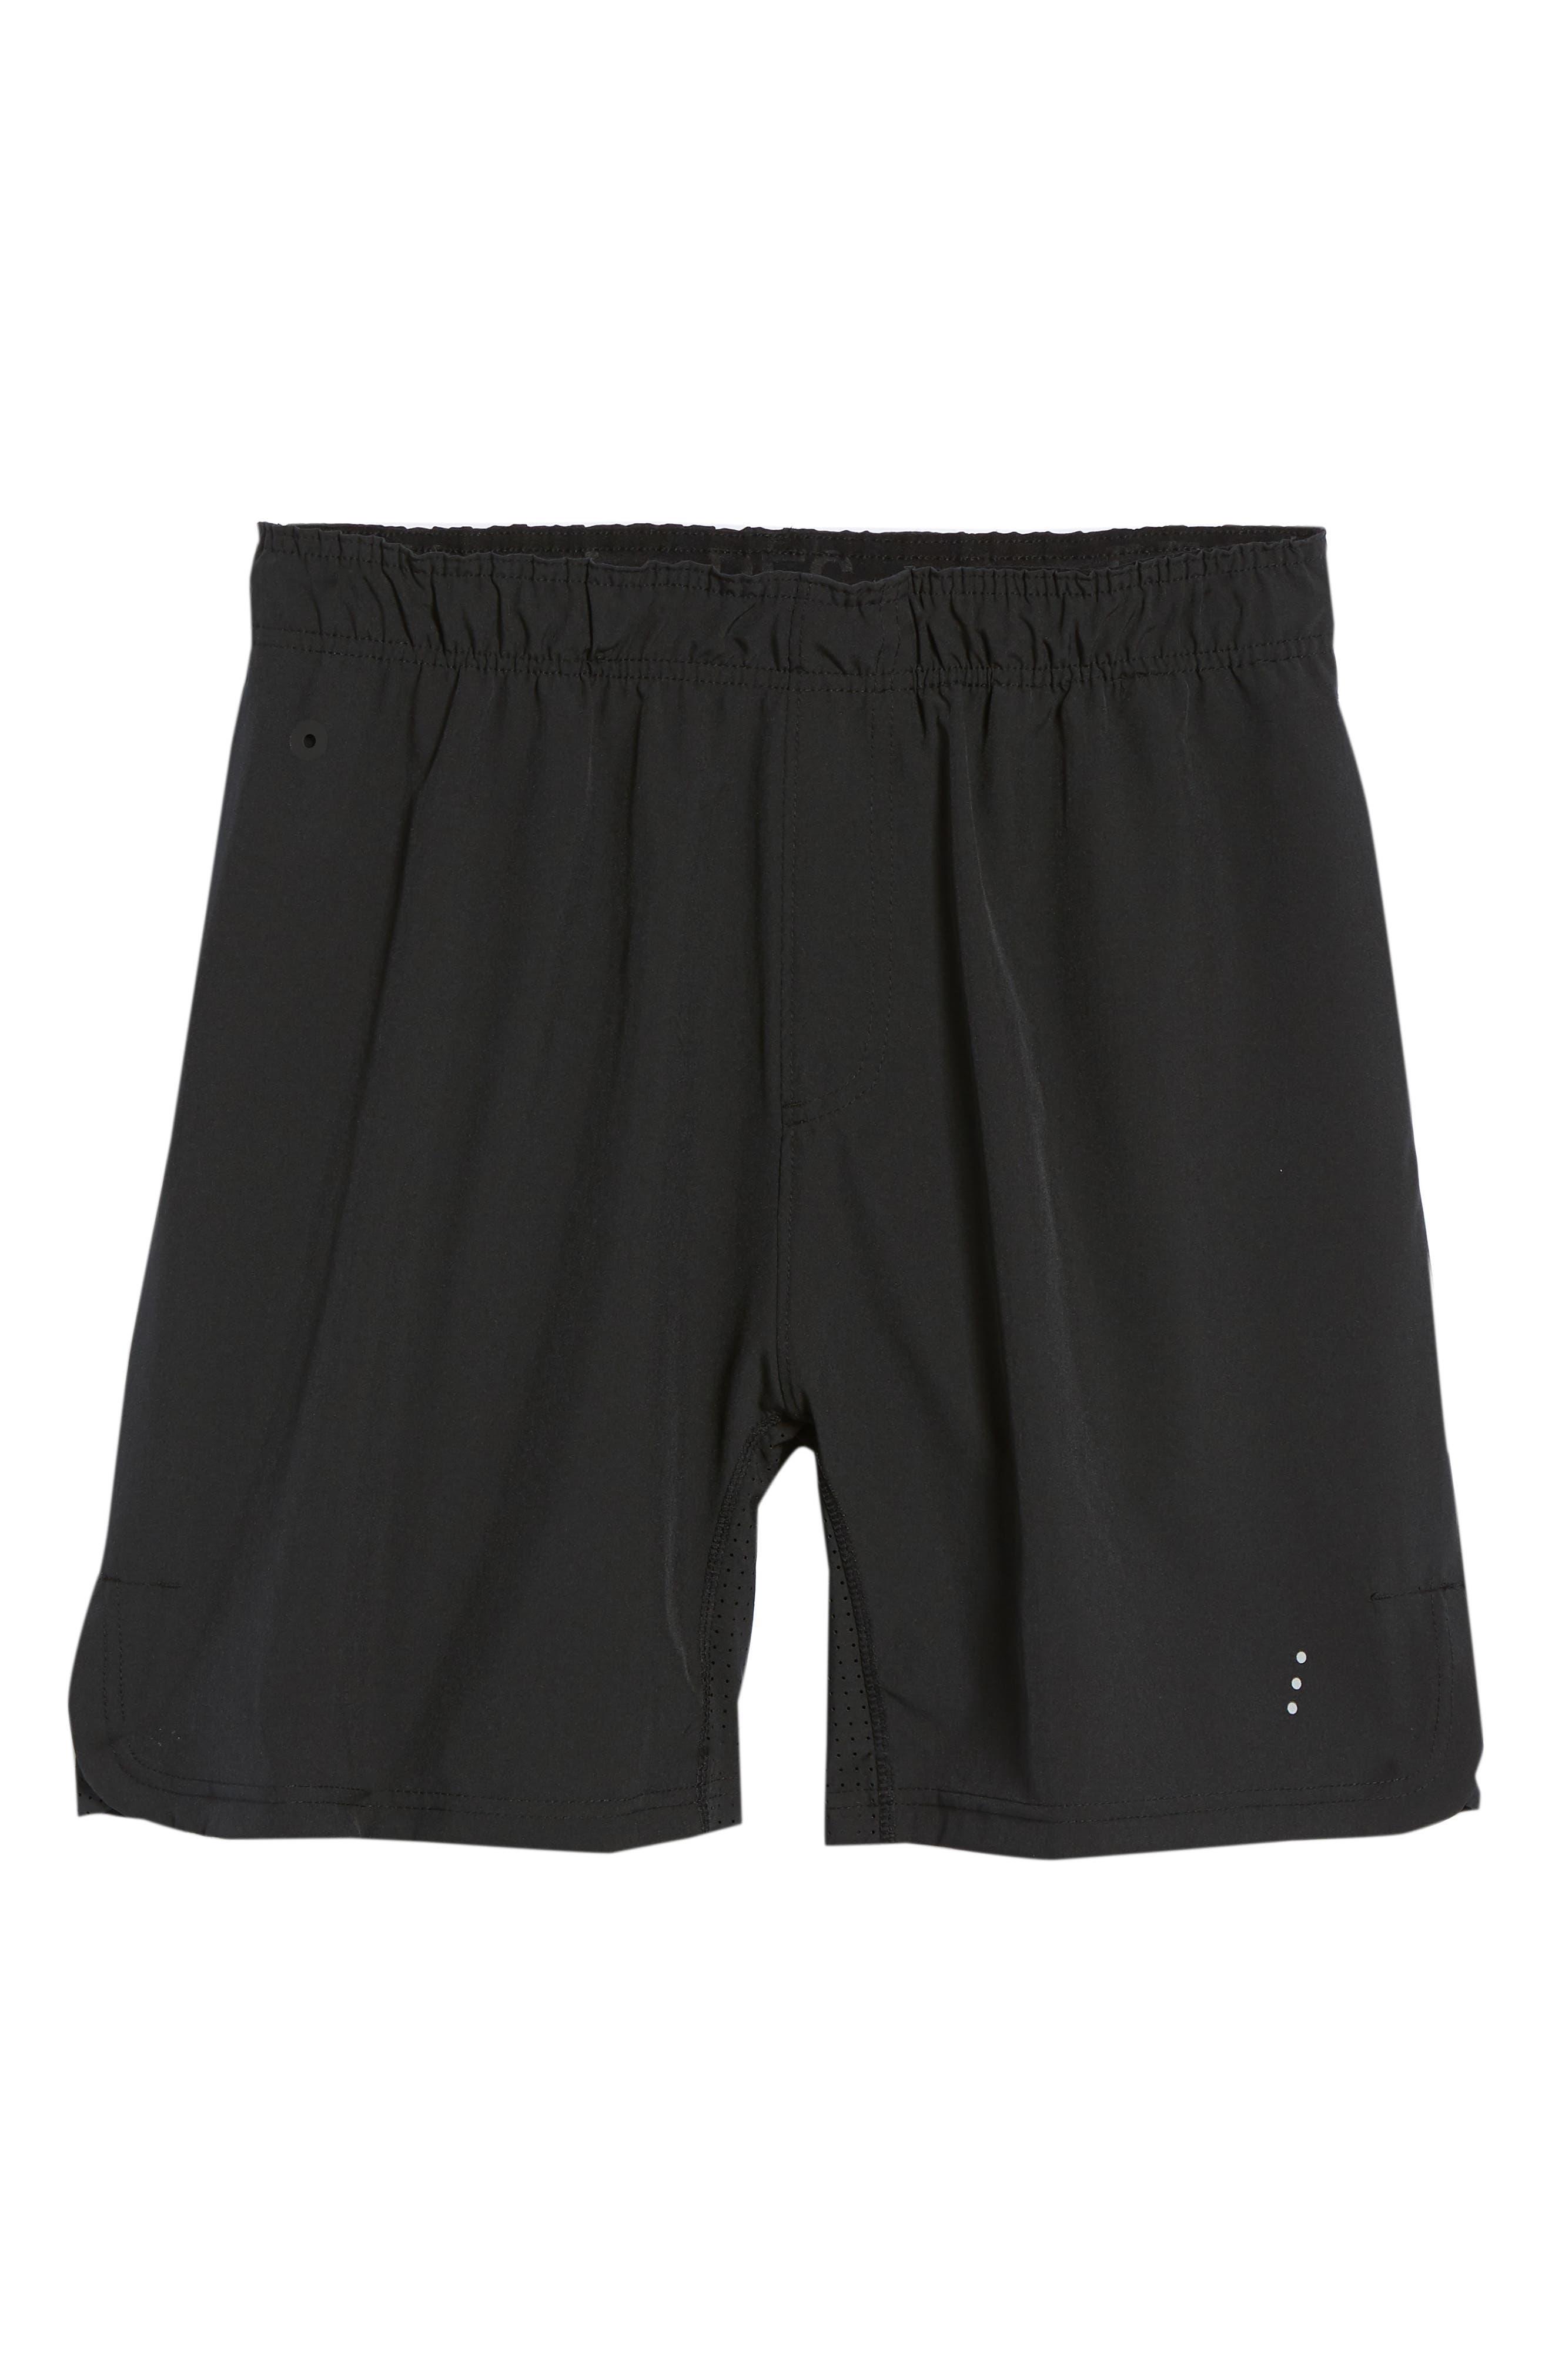 ZANEROBE Type 3 Tech Shorts,                             Alternate thumbnail 6, color,                             001